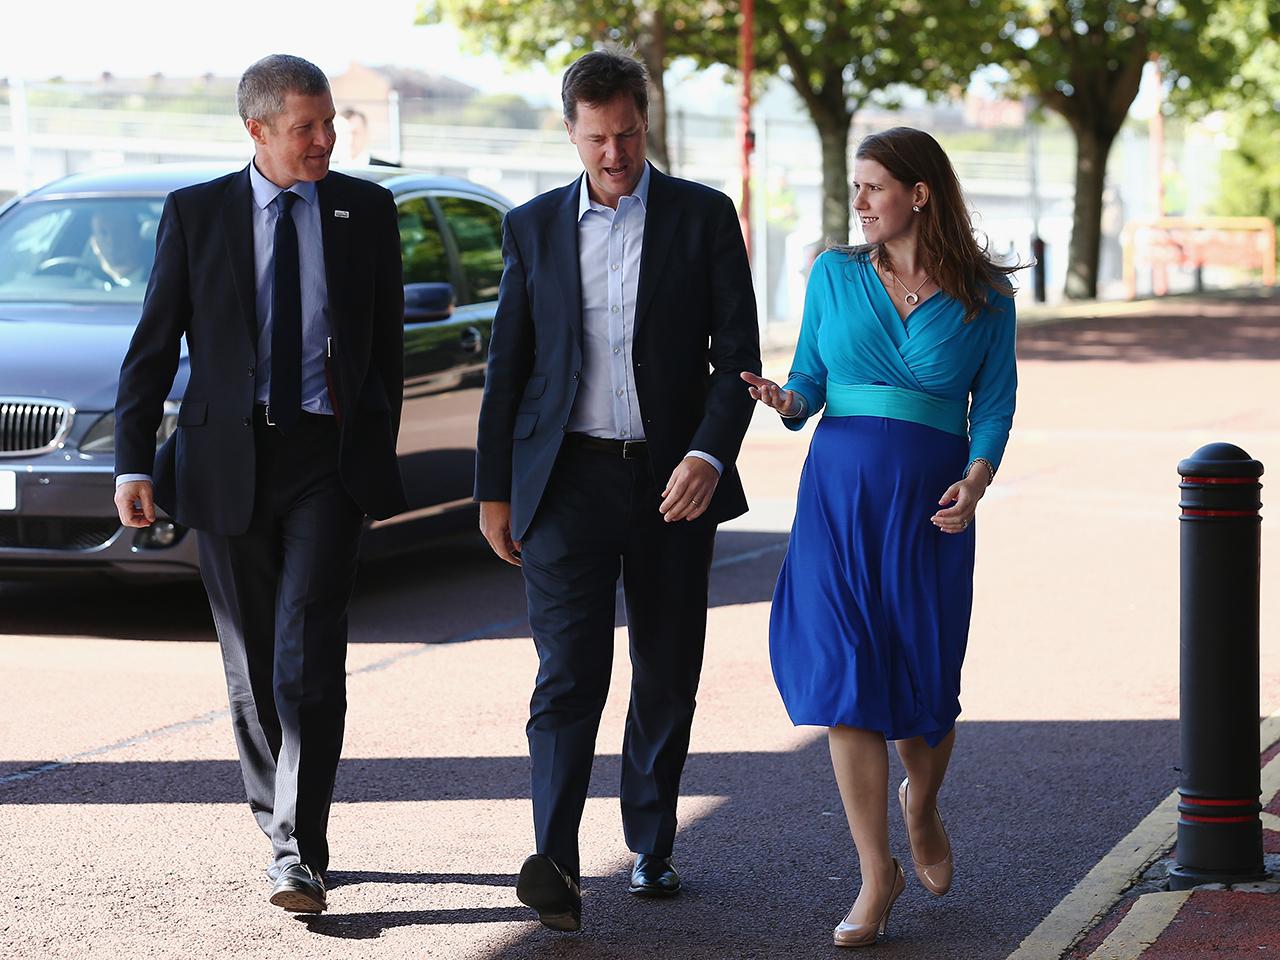 More Debate Prep >> Pregnant politician sparks debate over seat-offering etiquette - TODAY.com